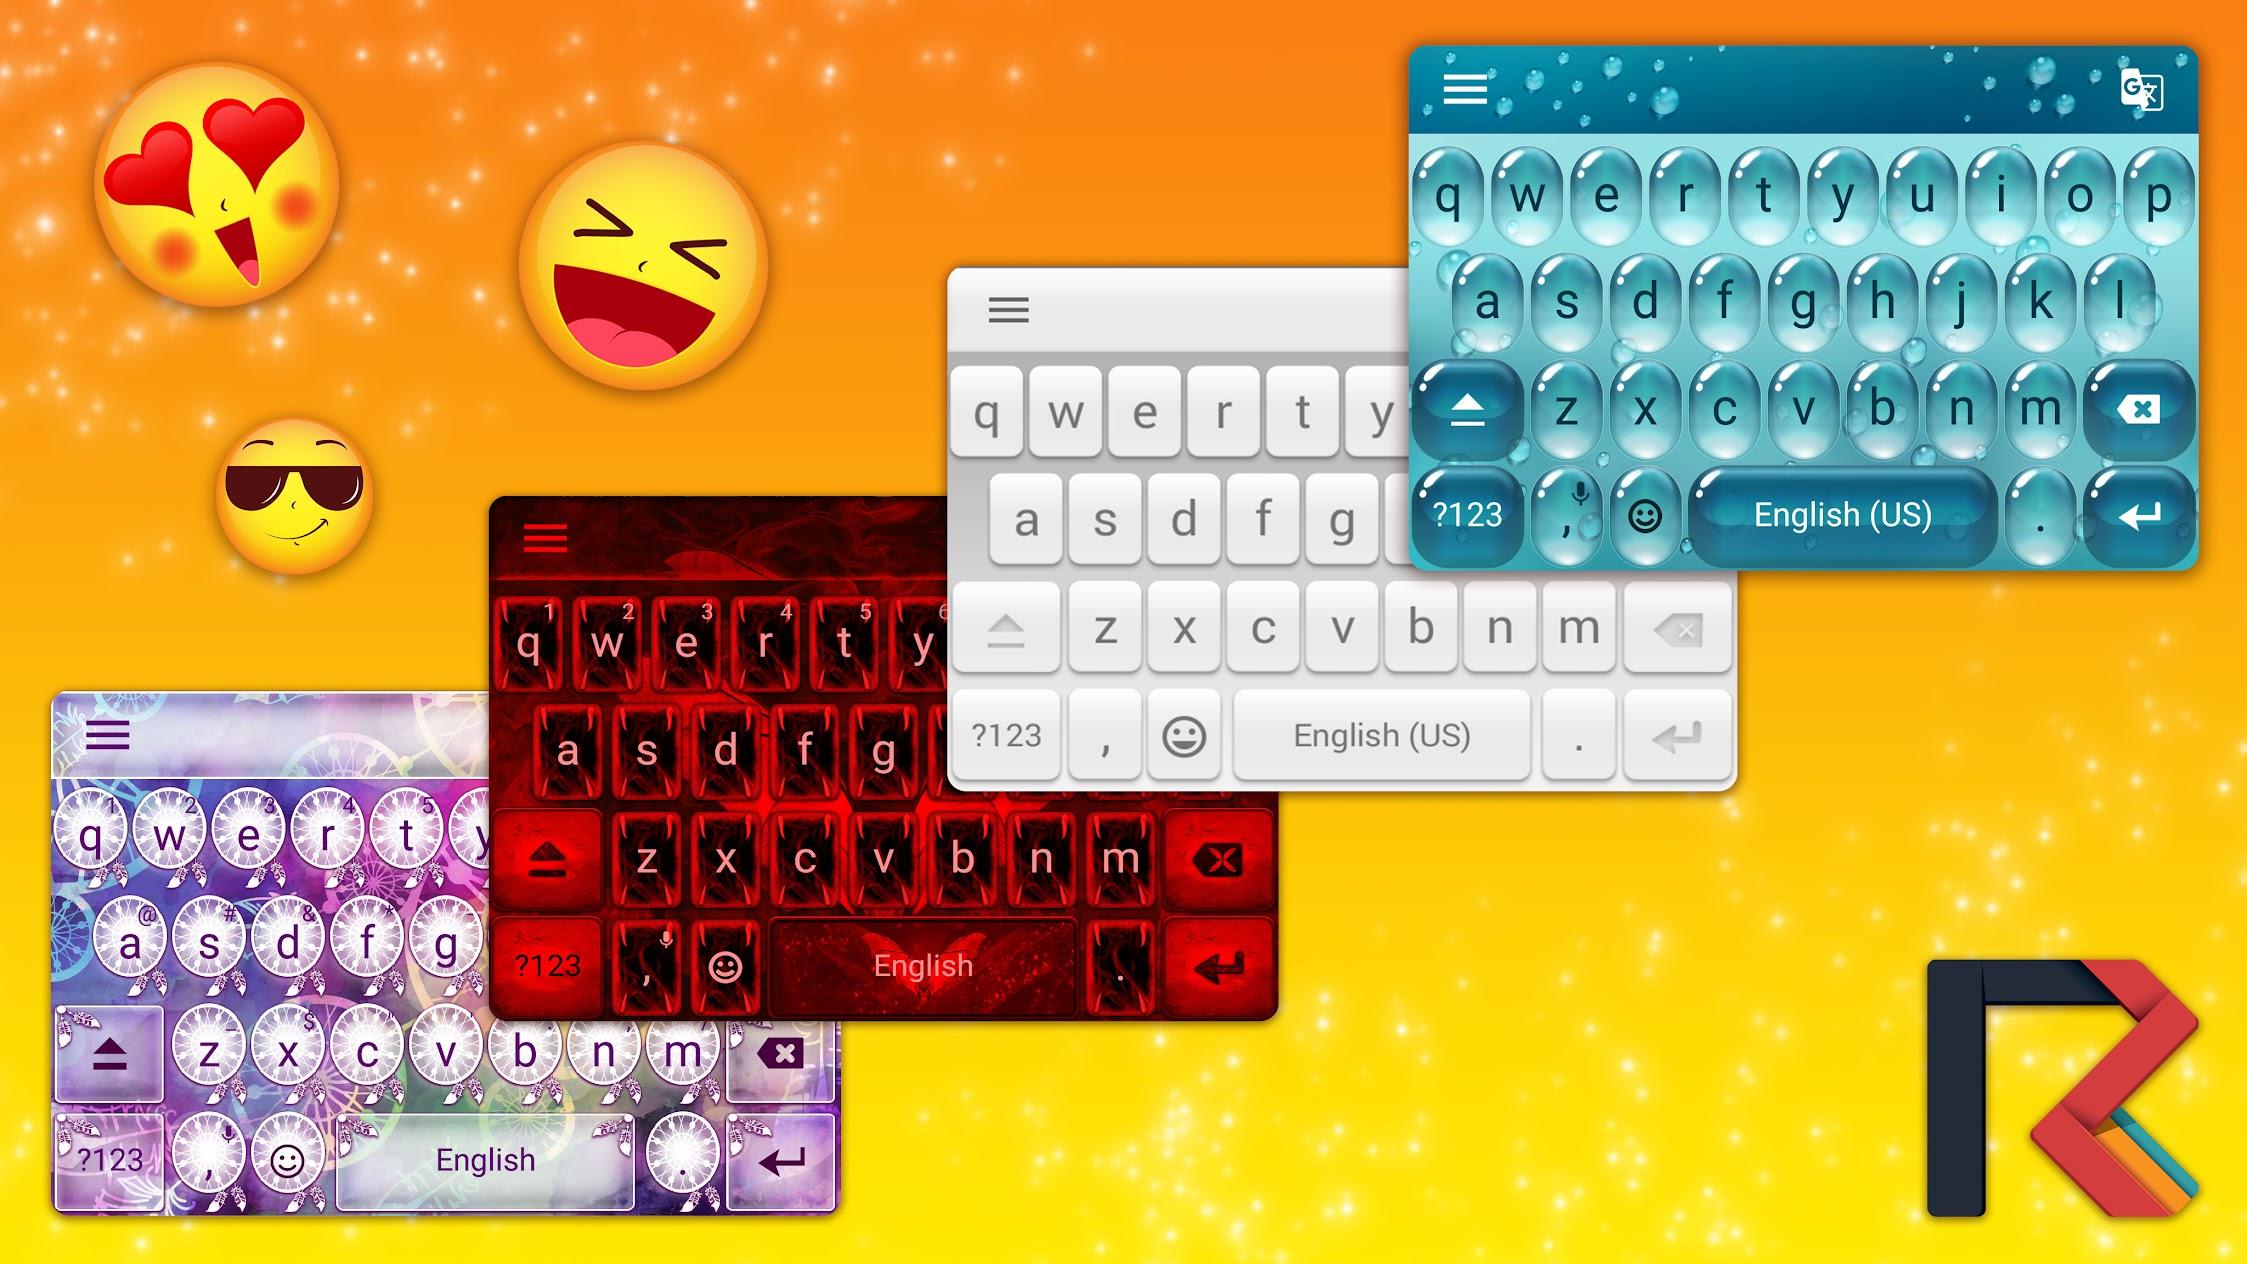 2018 Keyboard, Themes & Stickers